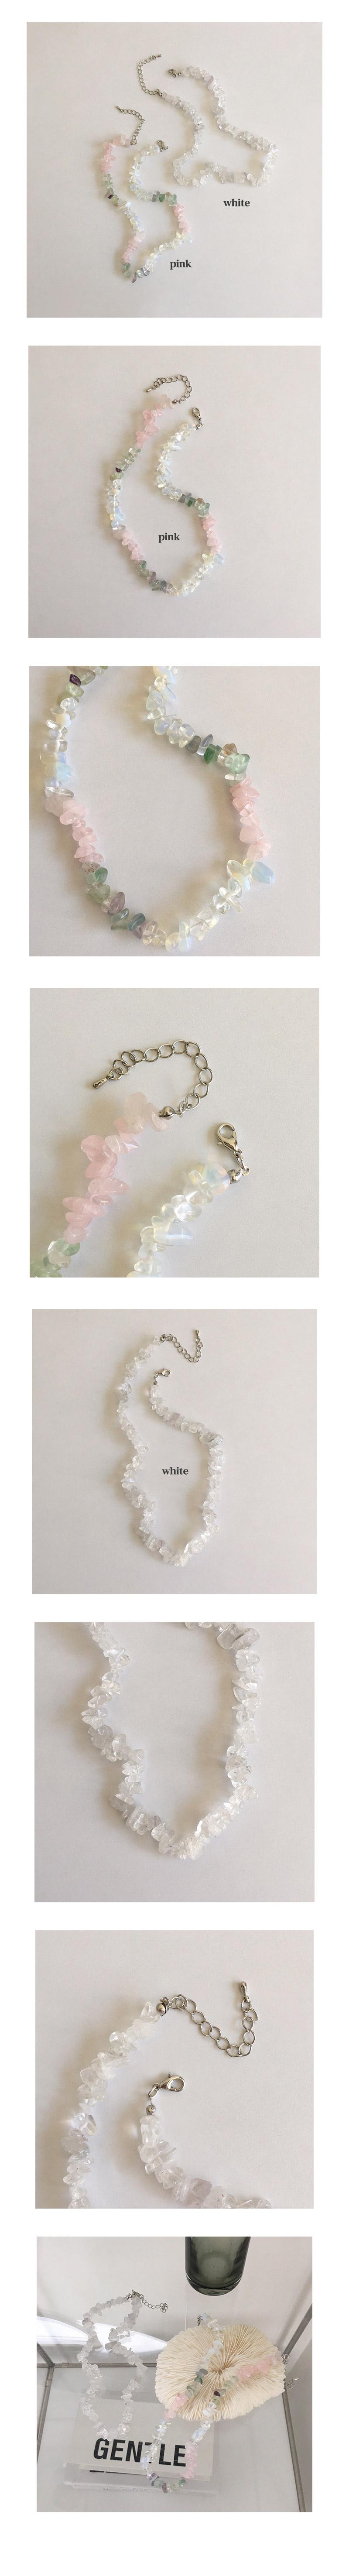 pure gemstone necklace